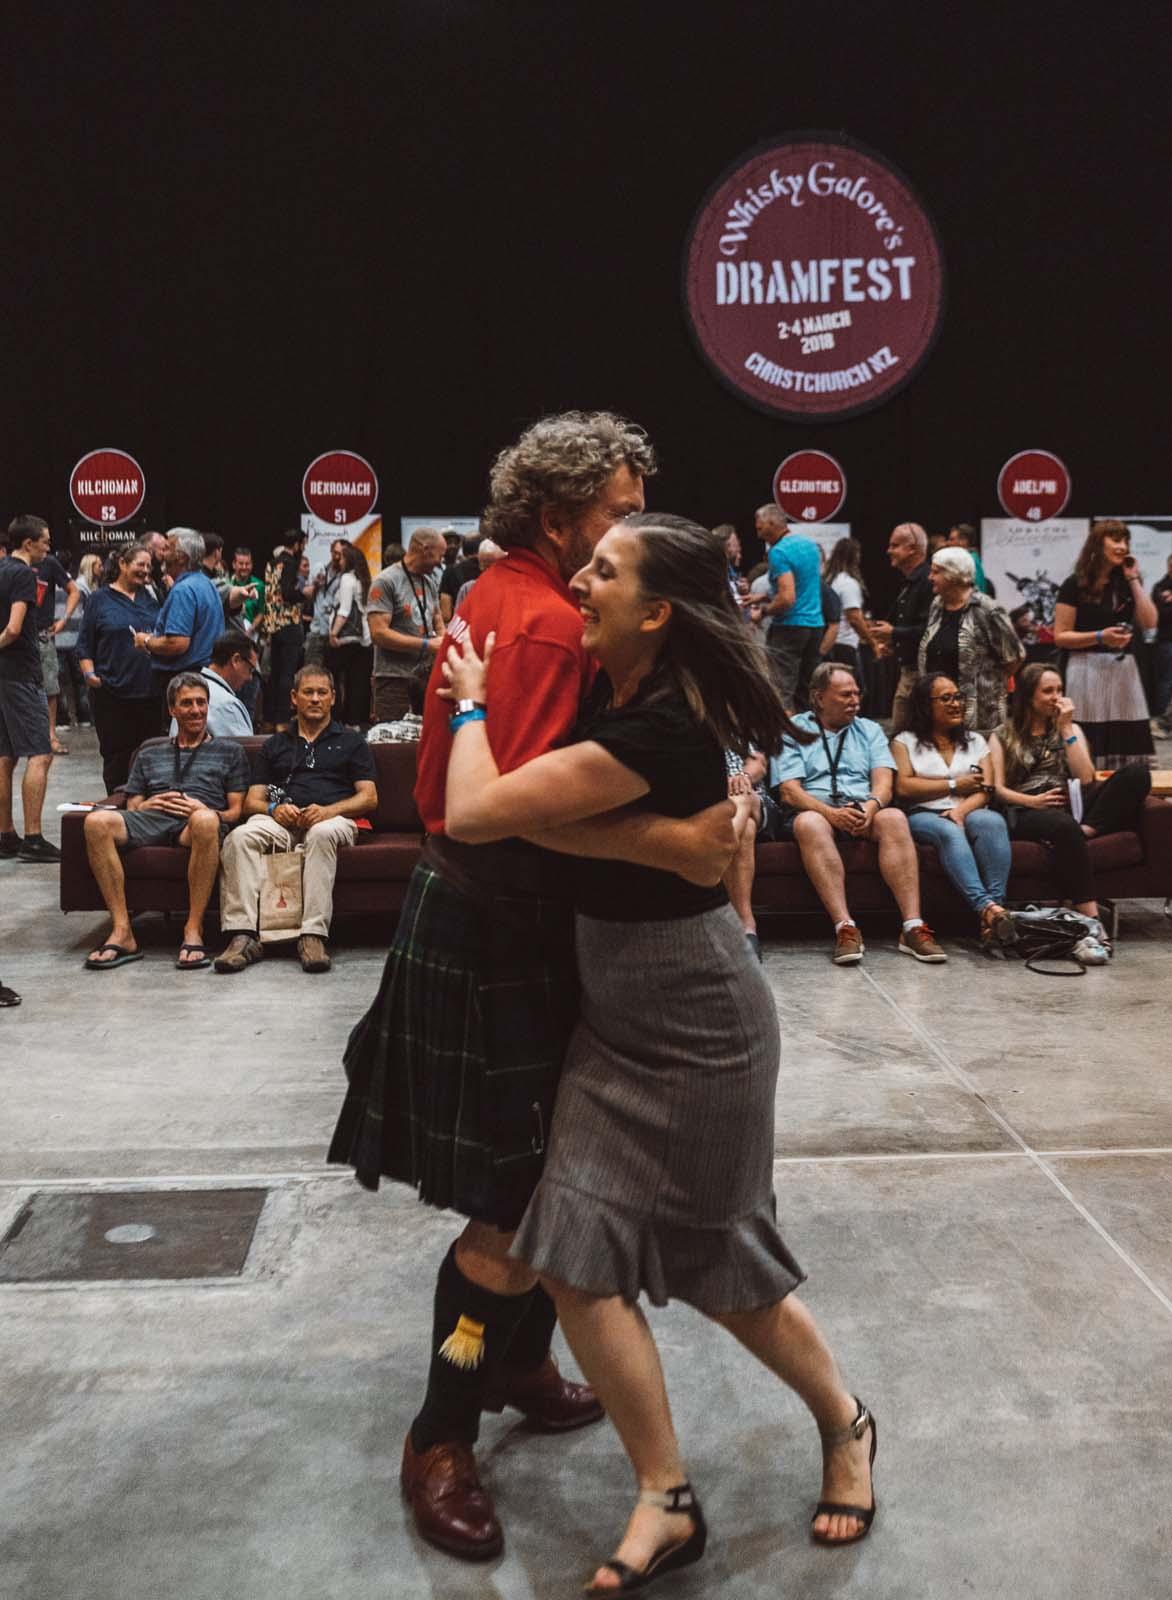 Dramfest 2018 for Whisky Galore-77.jpg